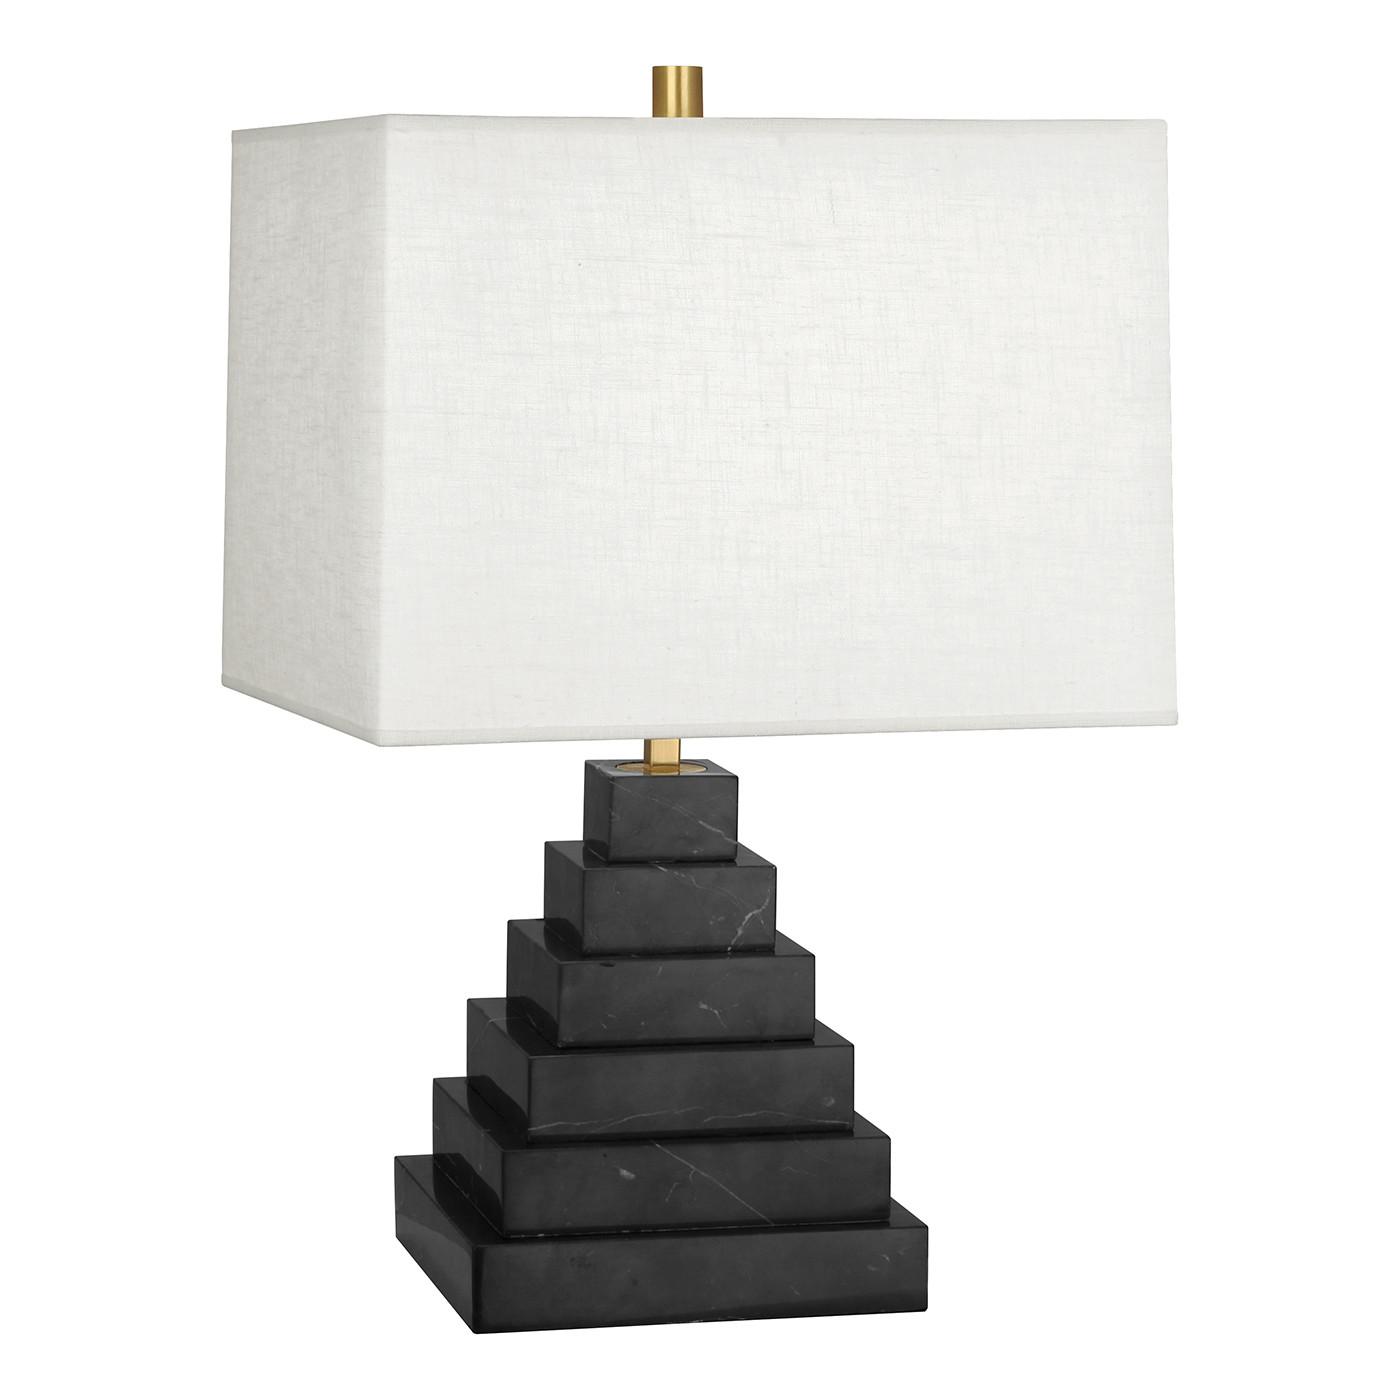 Canaan Pyramid Black Marble/White Shade Table Lamp